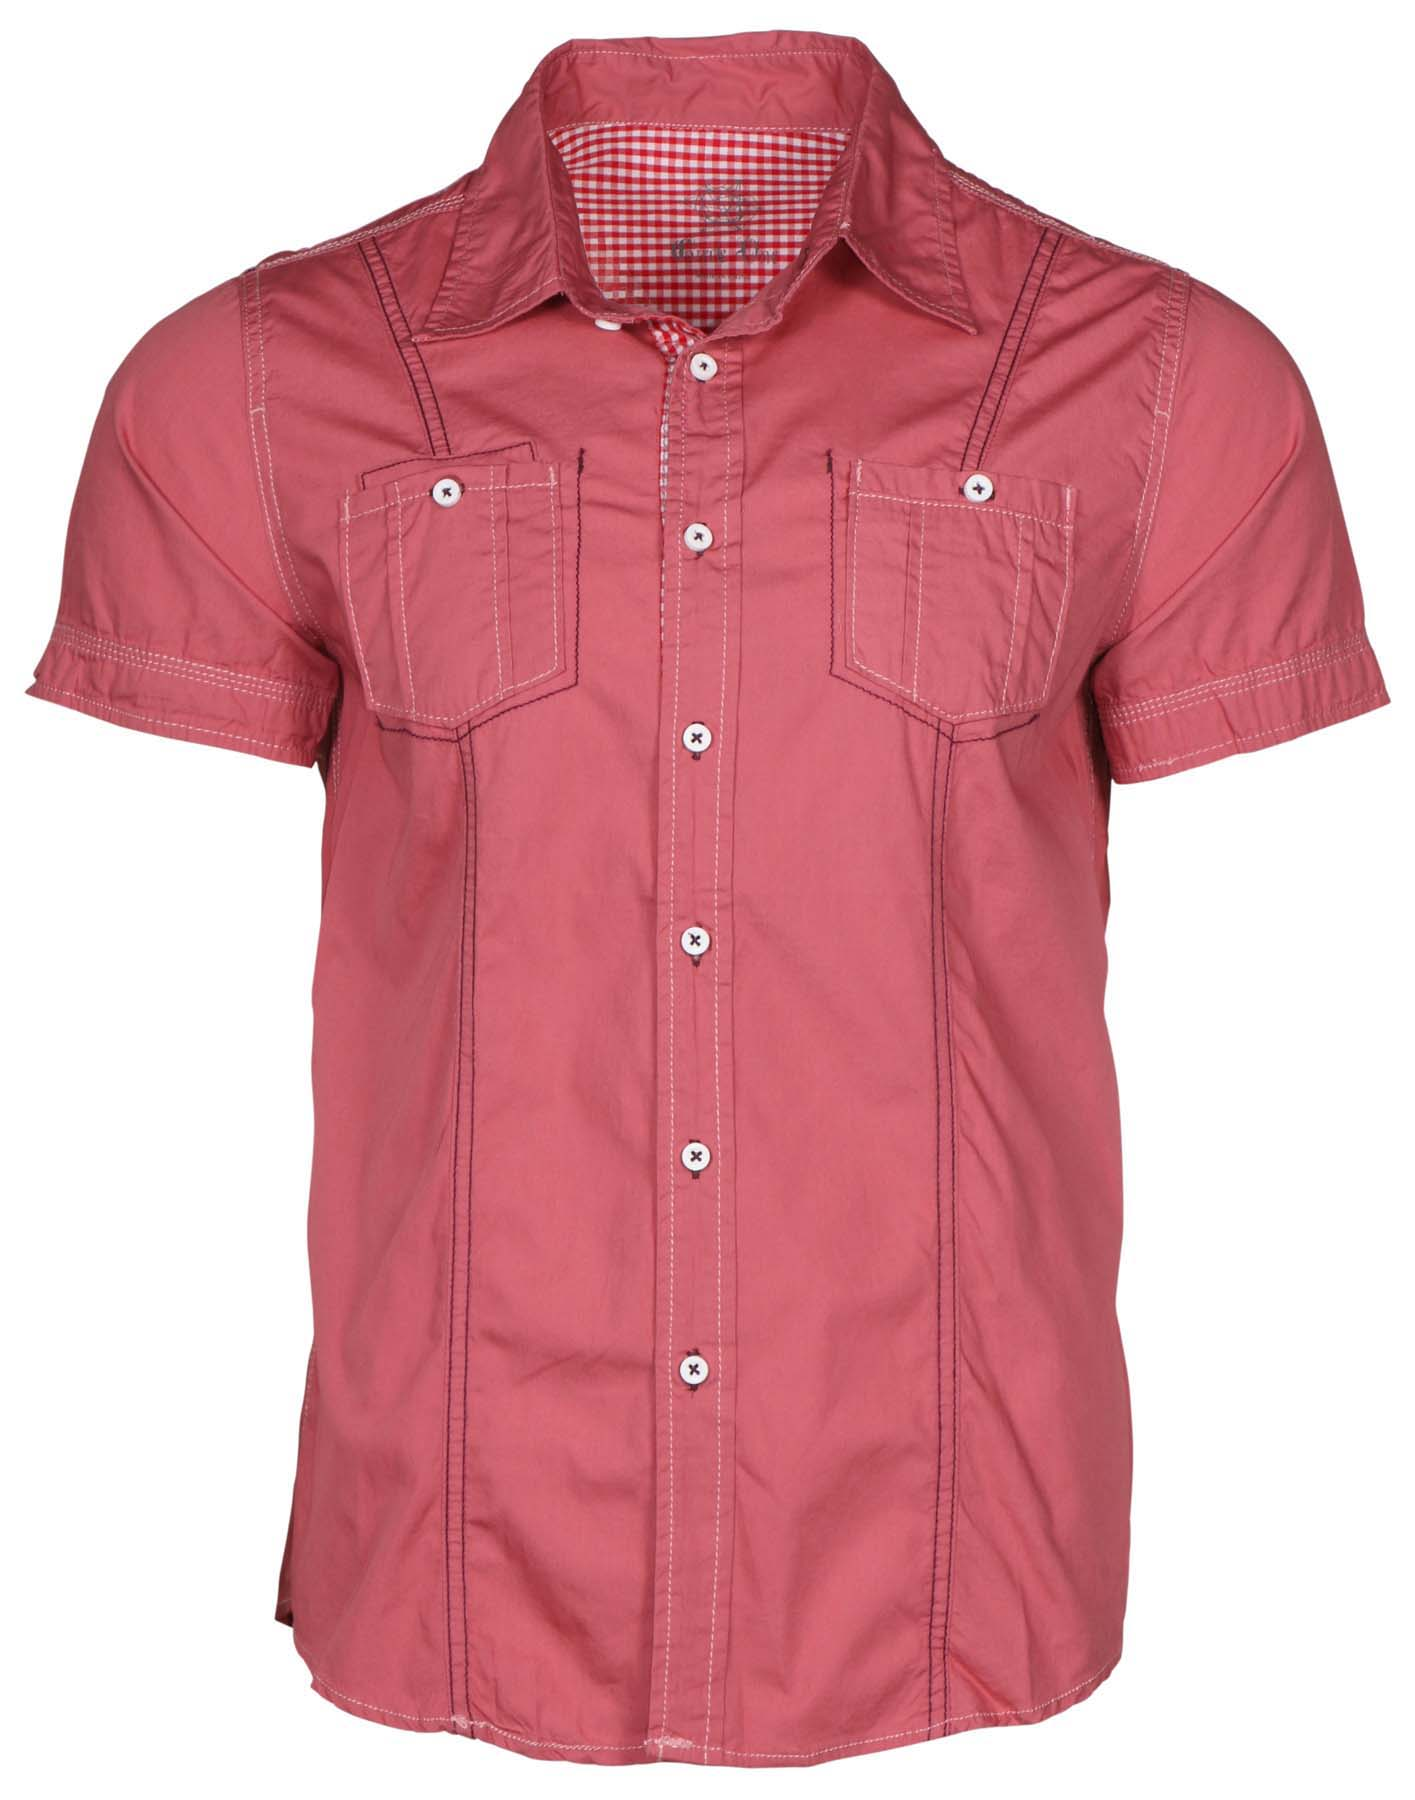 Circle One Men's Short Sleeve Casual Button Down Shirt | eBay